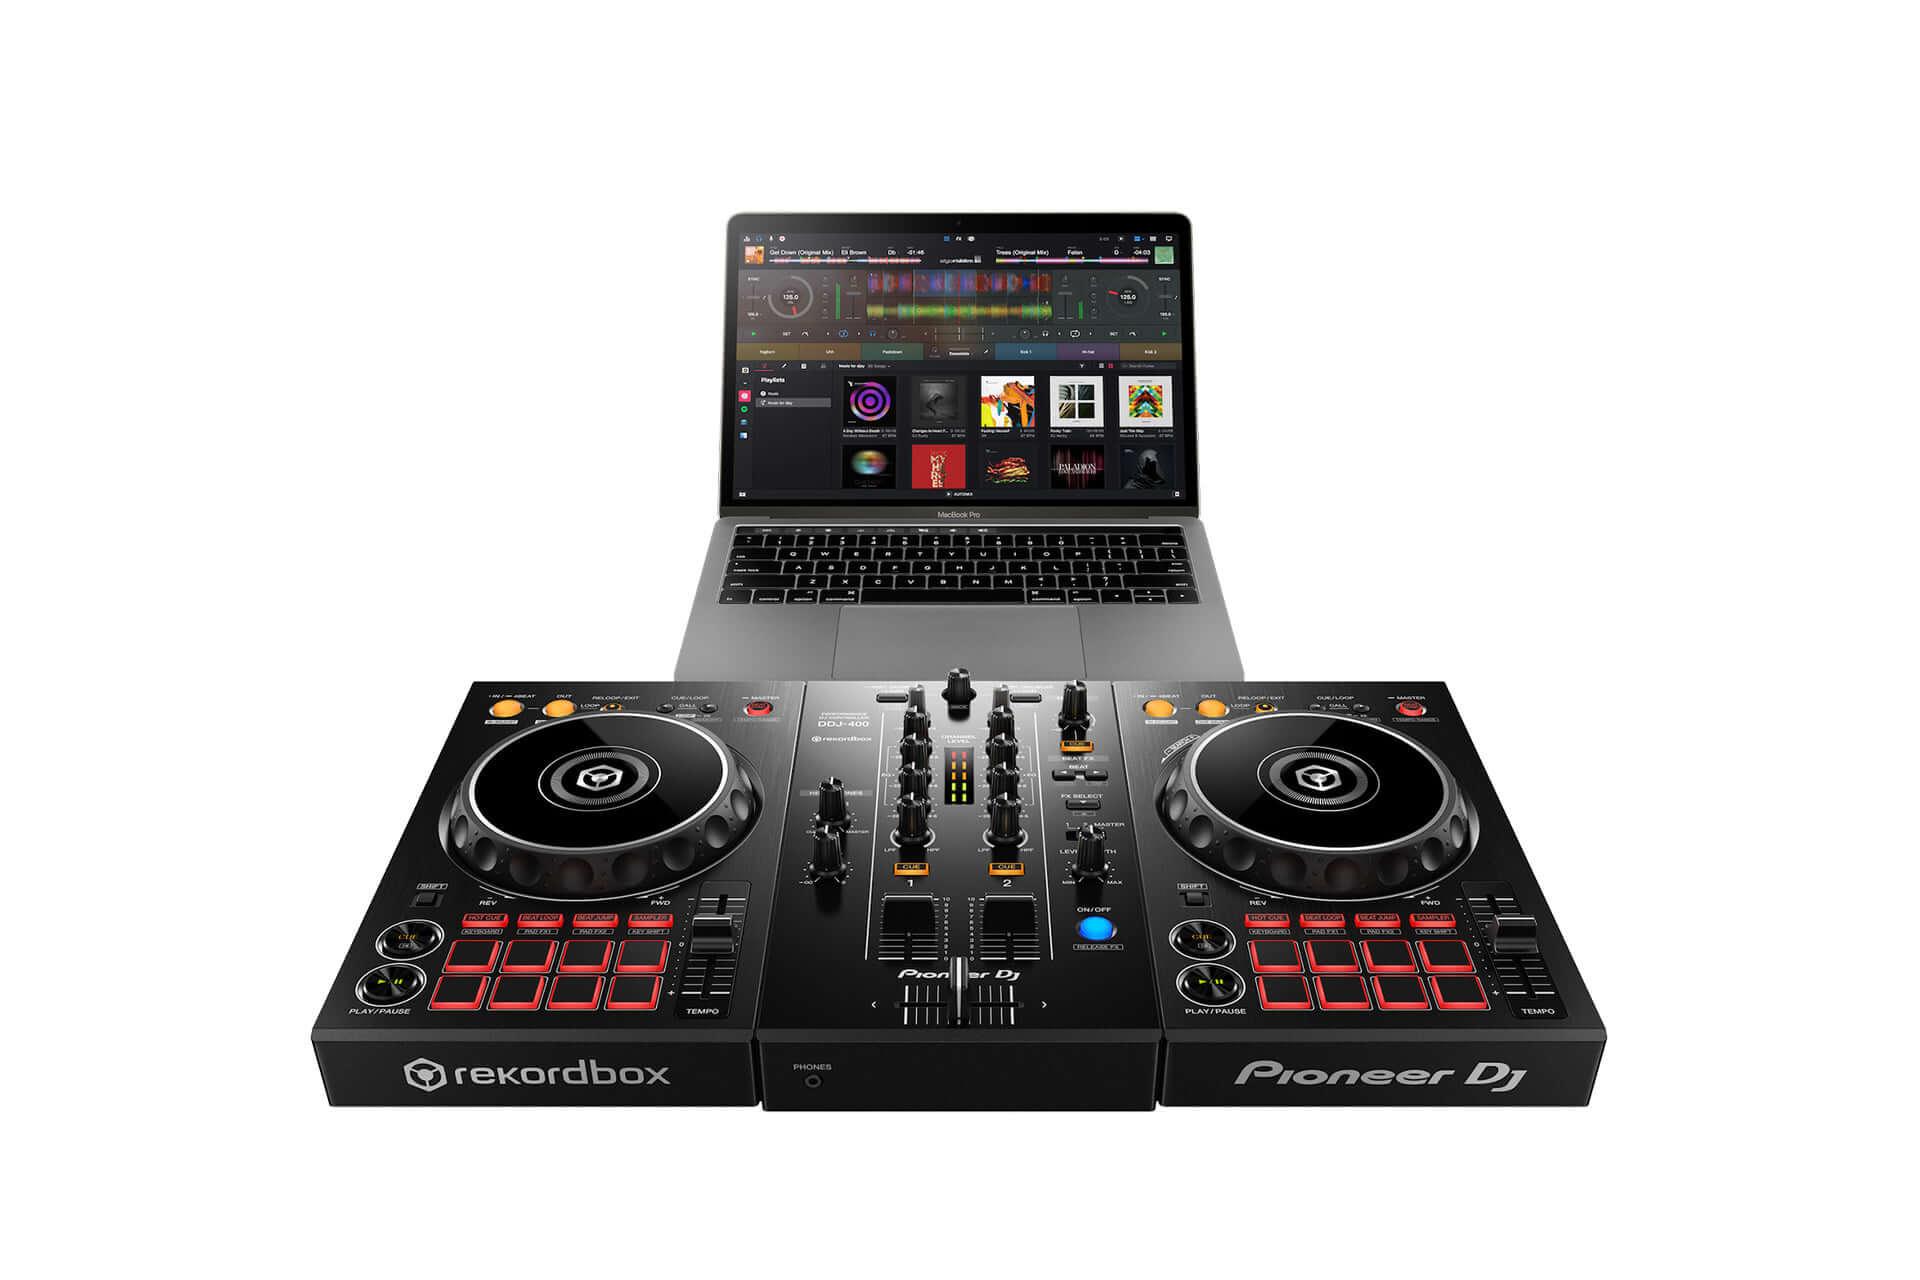 Pioneer「DDJ-400」で4,000万曲を超えるSpotifyの楽曲をプレイ可能に!アプリ「djay」に対応 tech190905_djay_ddj_main-1920x1280